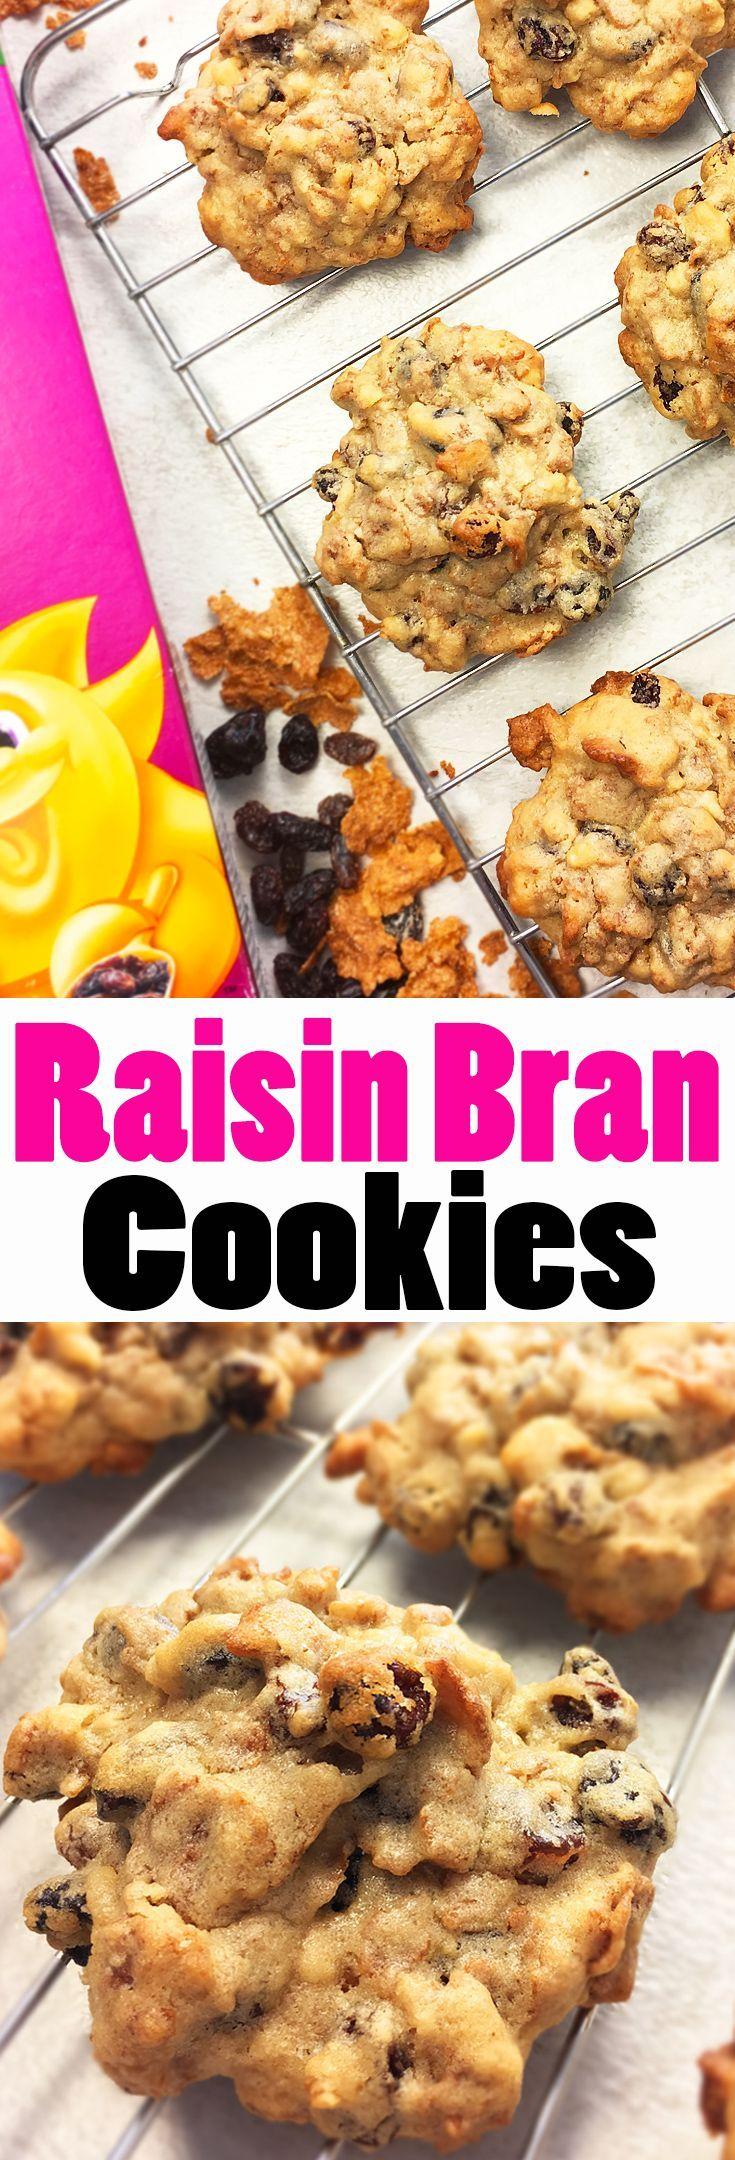 Easy Raisin Bran Cookies made with Kellogg's Raisin Bran Cereal. A #vintage #recipe featuring delicious molasses. #Raisin #bran #cookies #Yummy